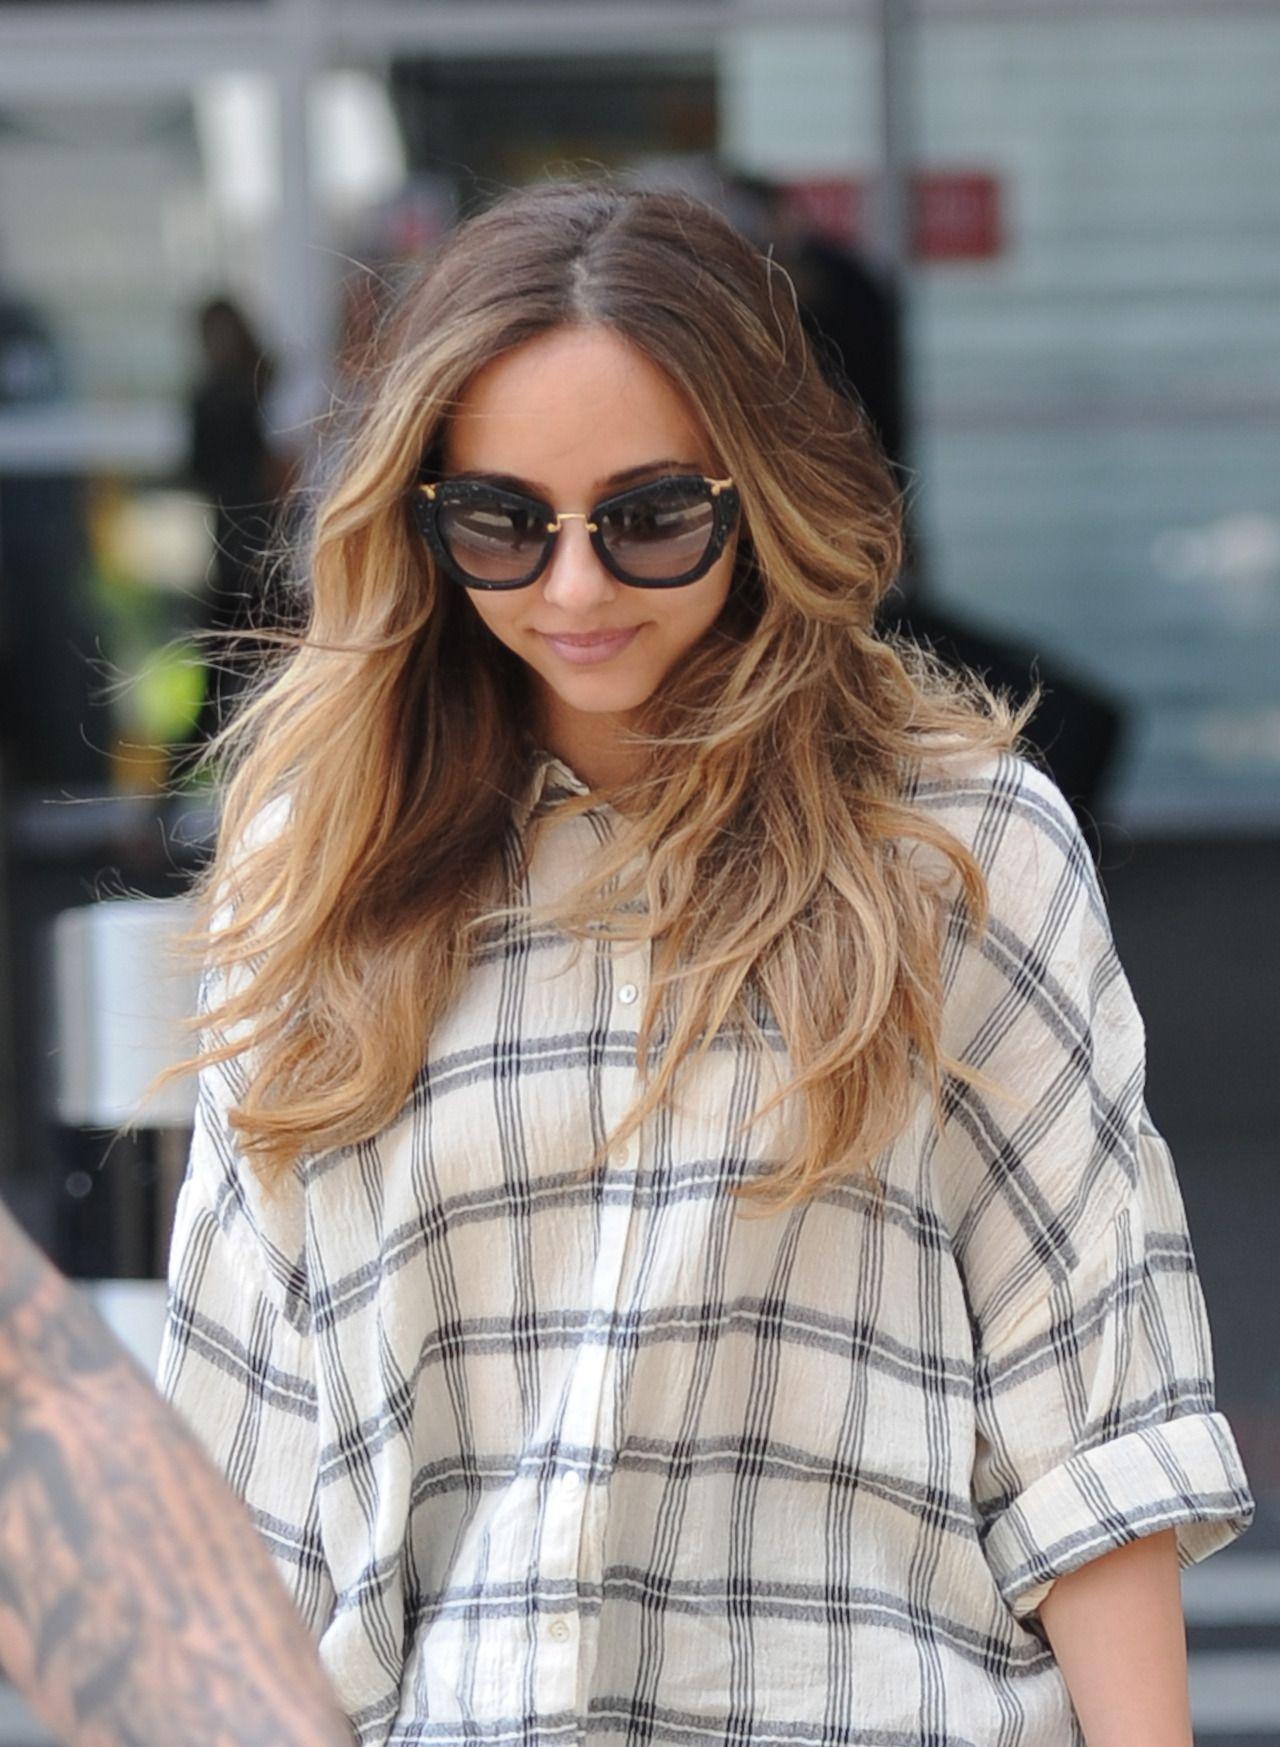 Jade Thirlwall arriving at Heathrow Airport - September 6, 2015